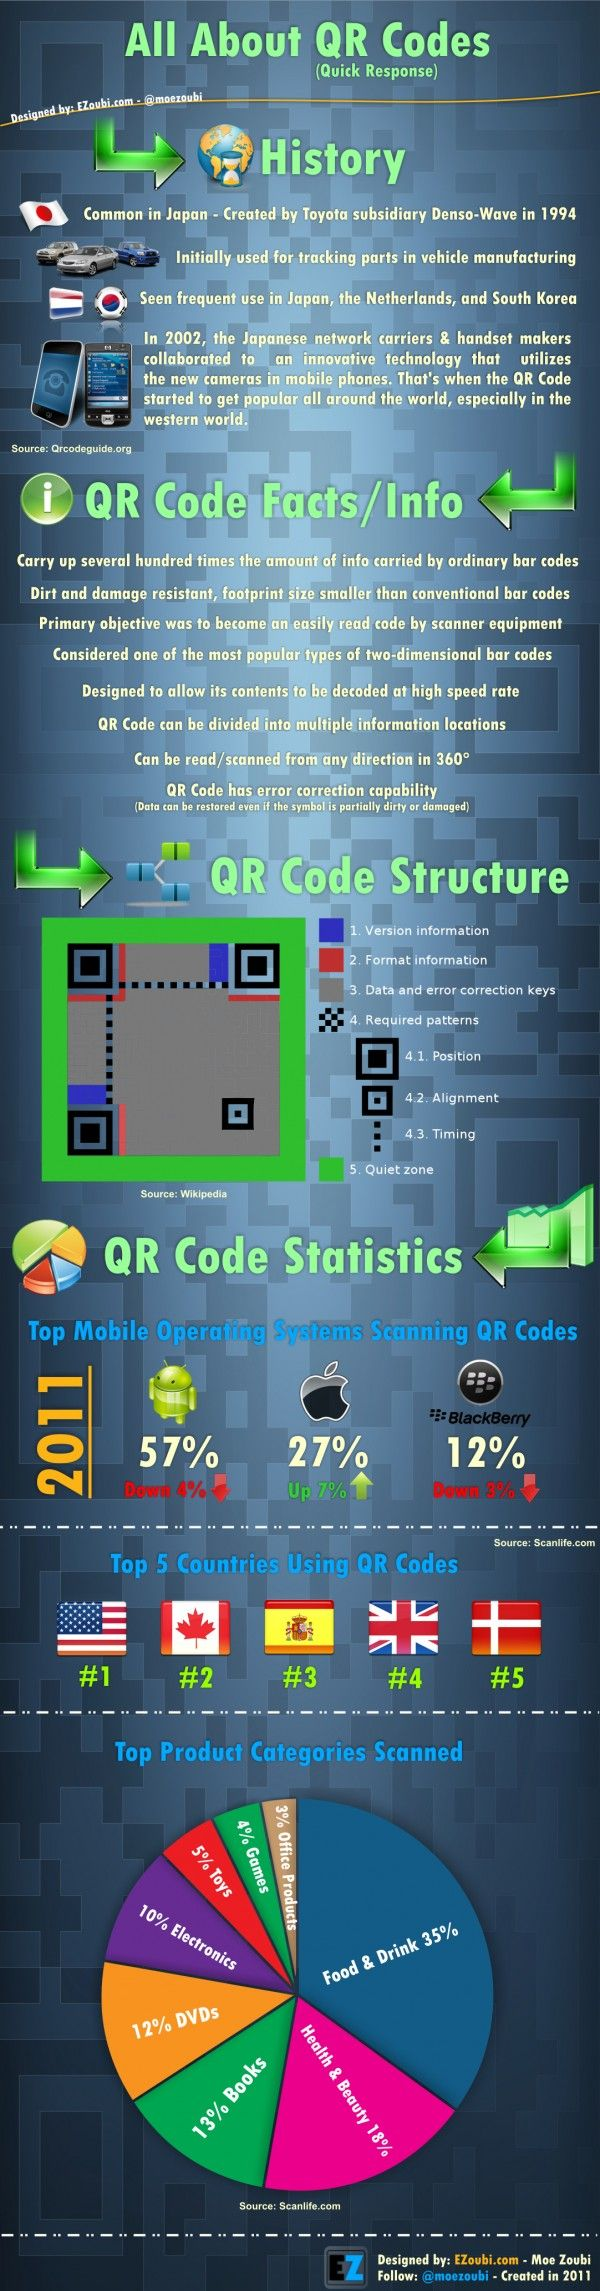 About #QR Codes